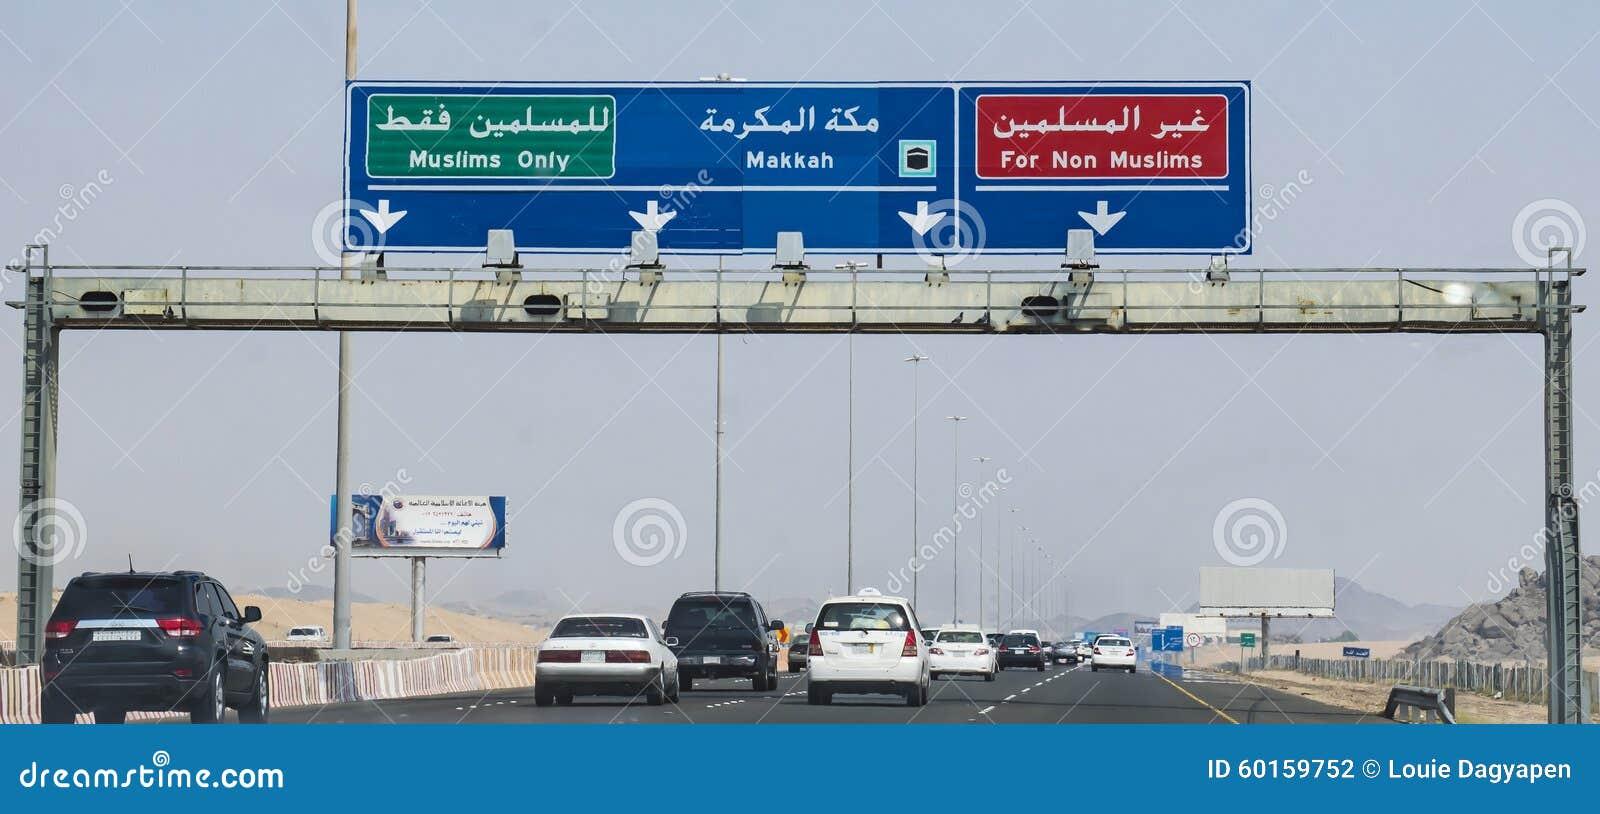 mecca sign